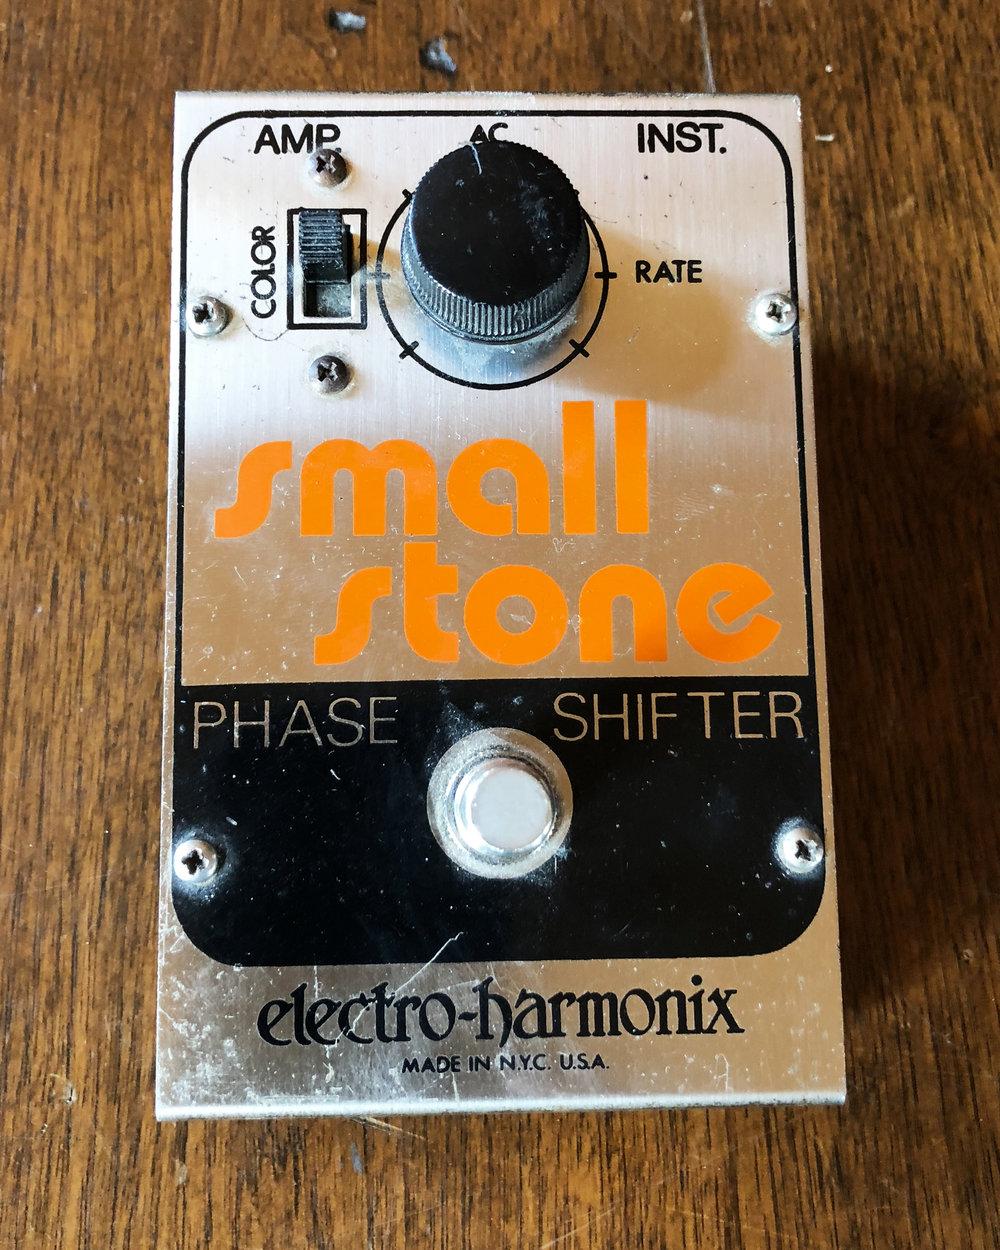 Electro-harmonix Small Stone